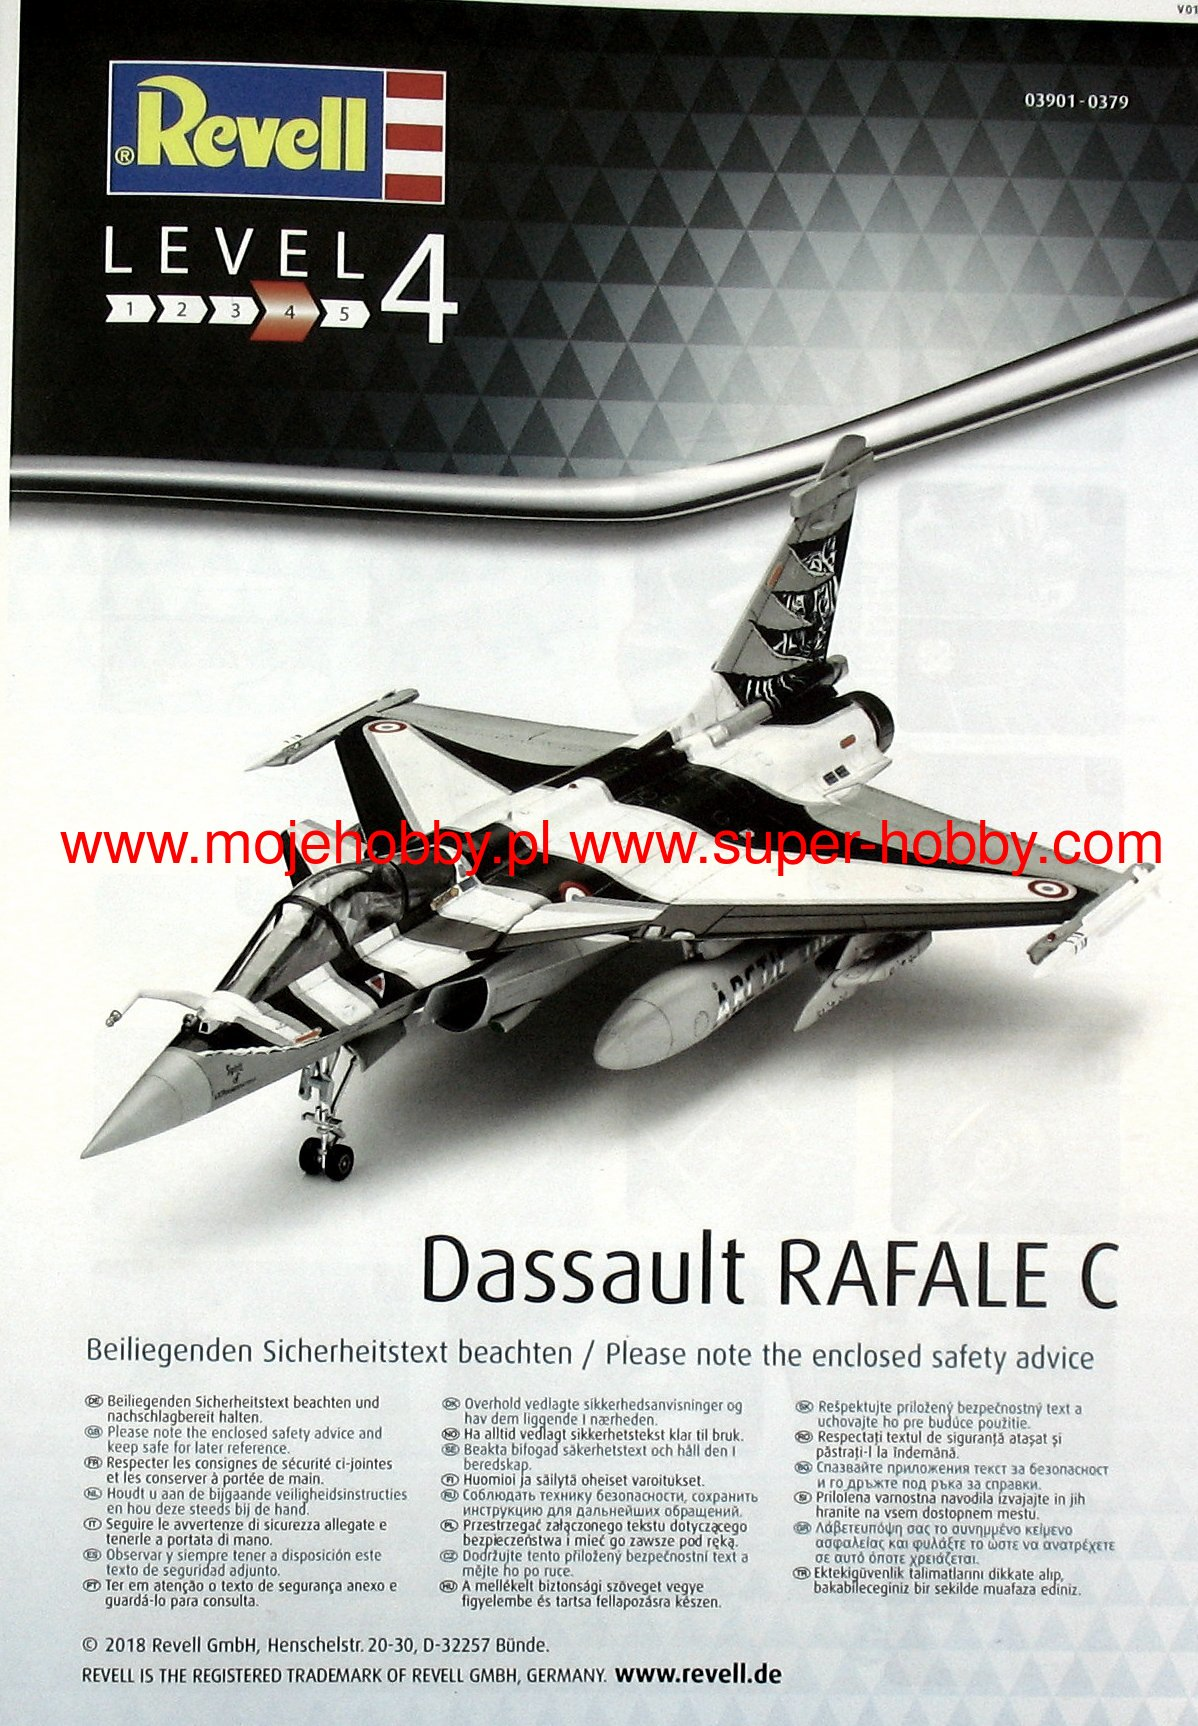 Dassault Aviation Rafale C in 1:48 4009803901 Revell